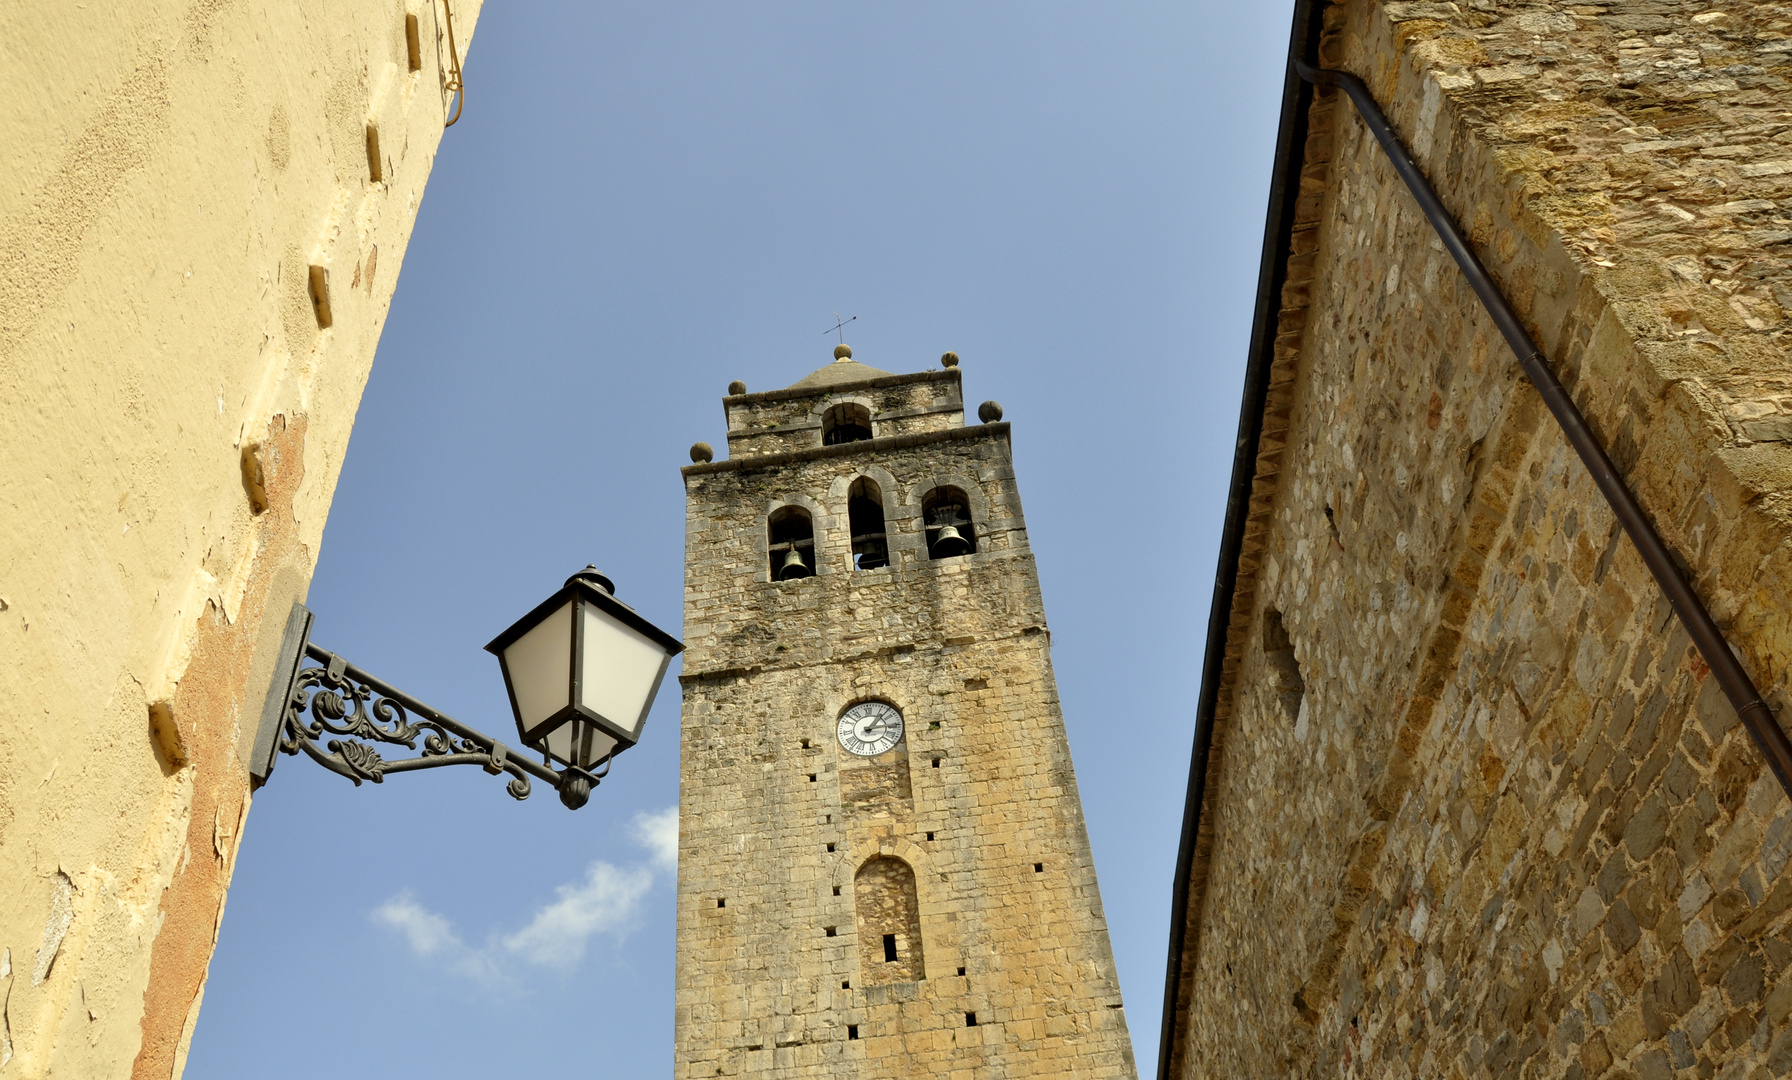 Kirche in Sant Llorenç de la Muga (Girona)